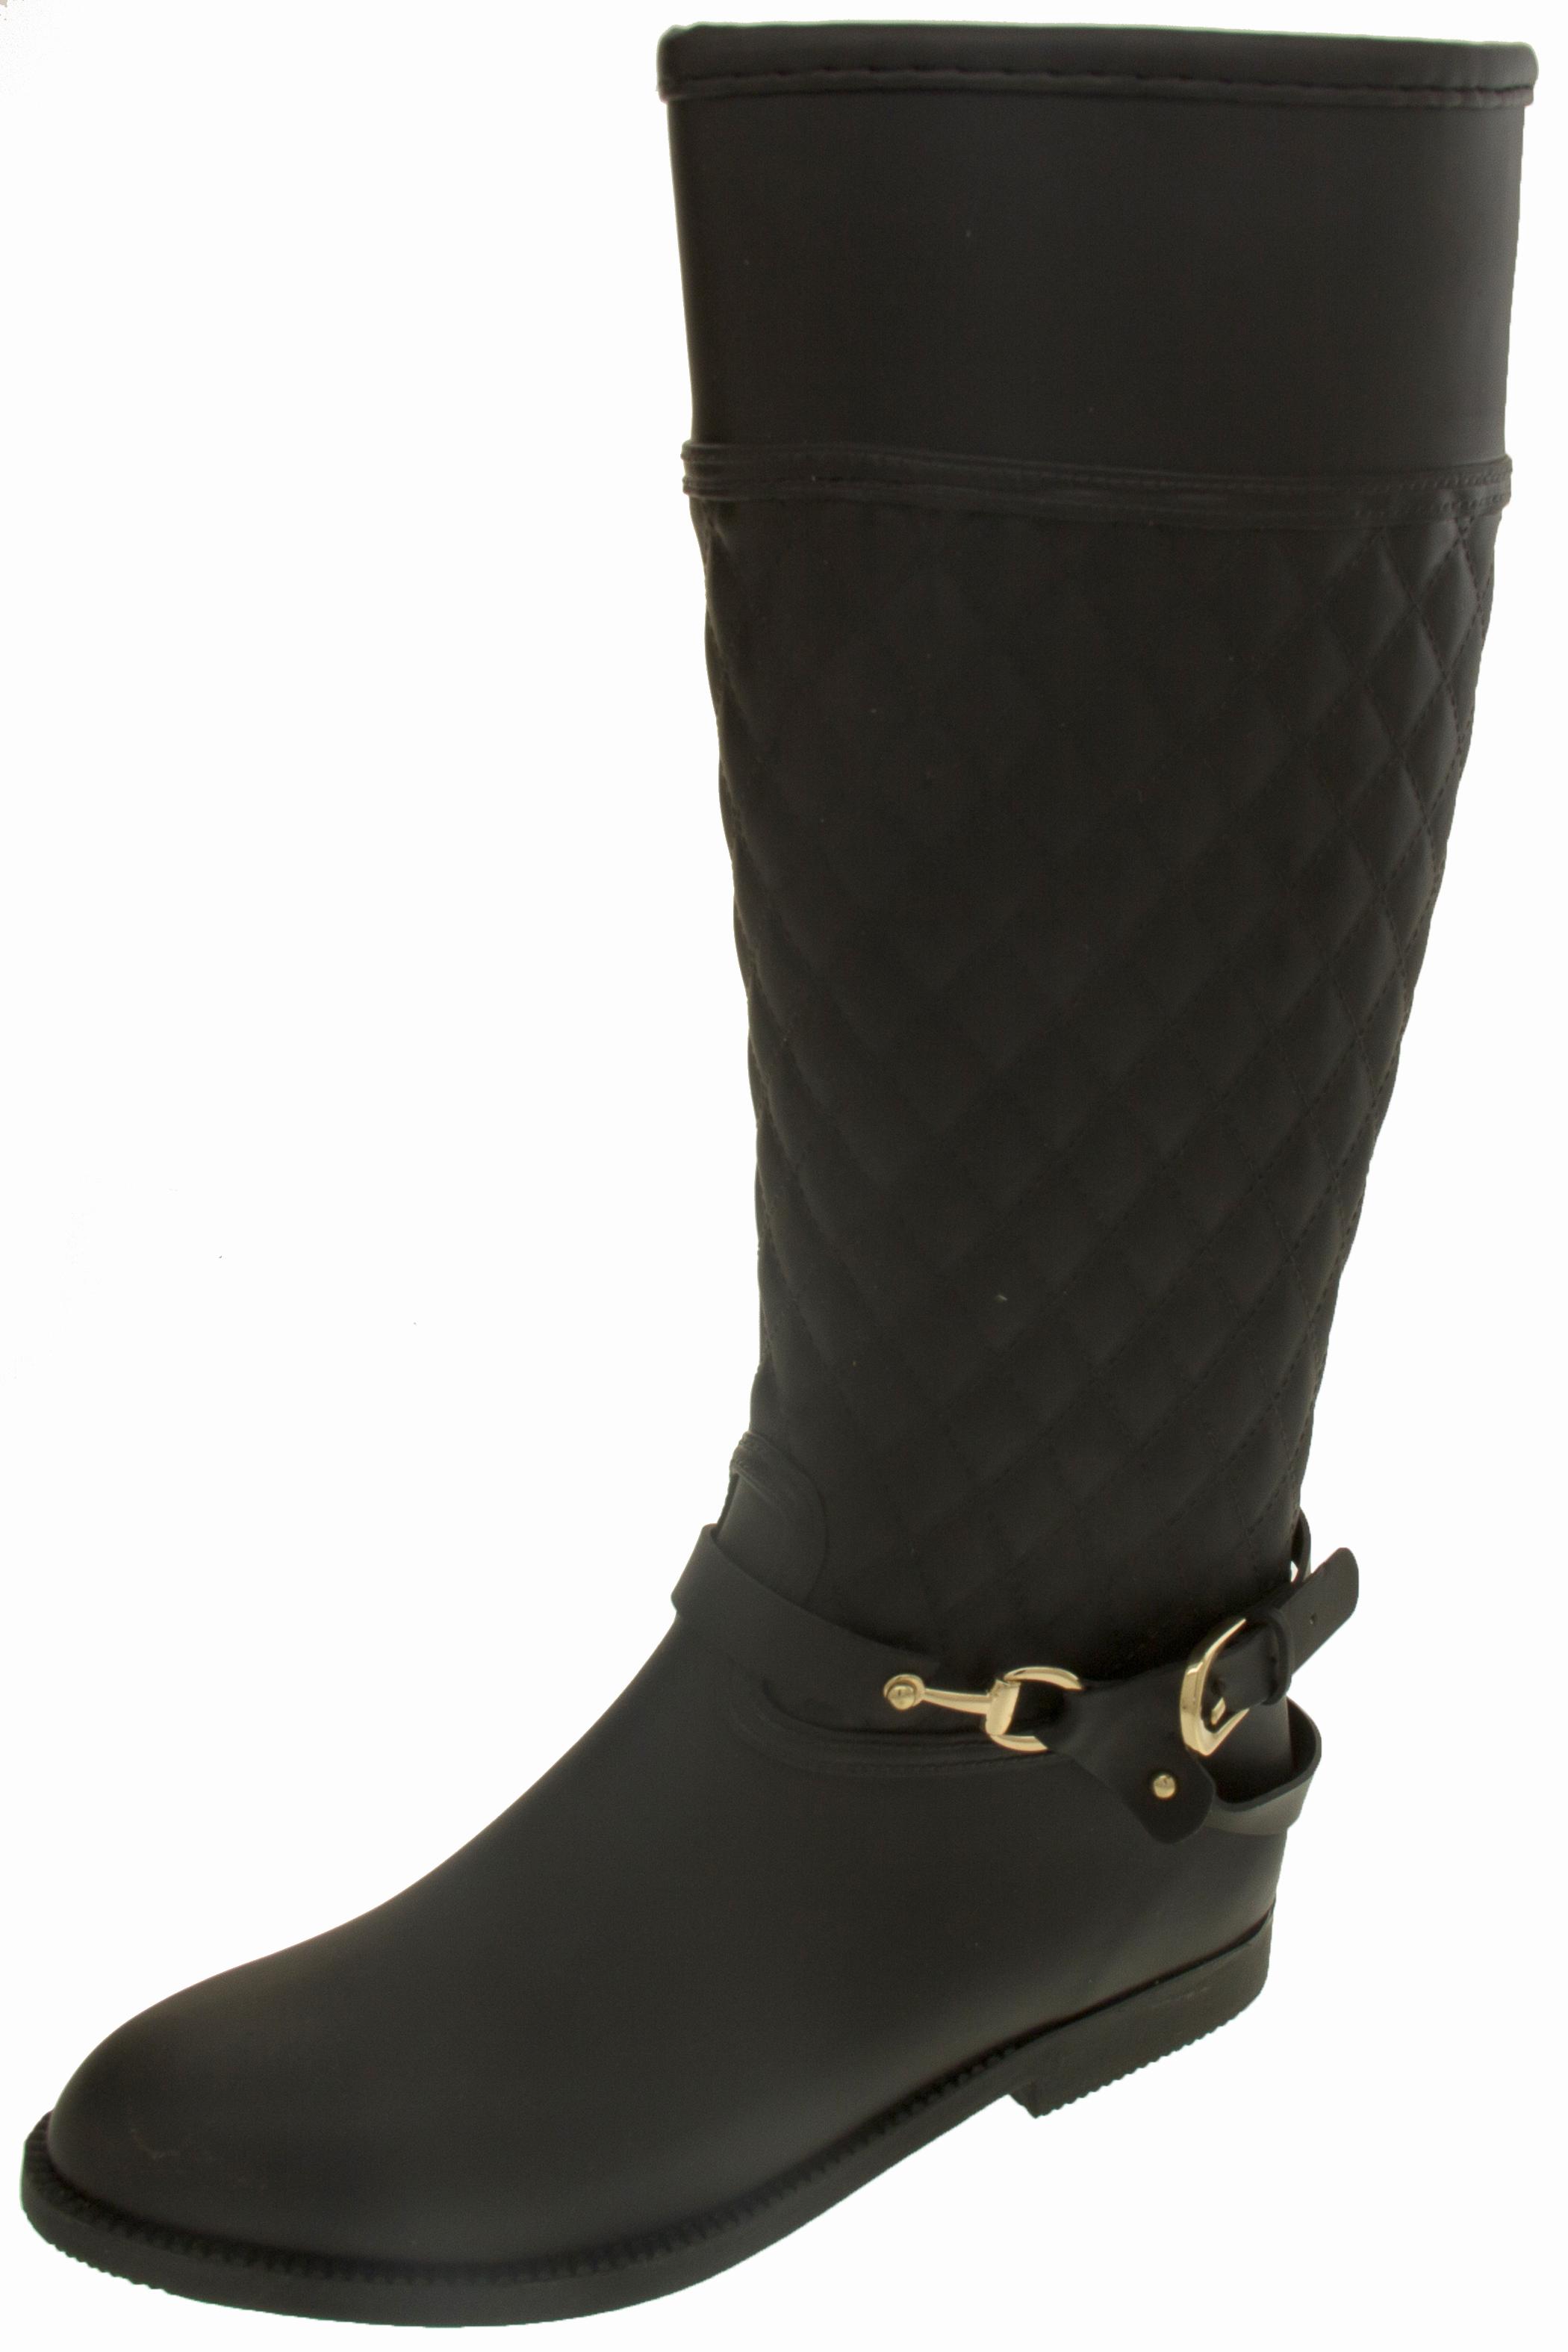 Ladies Keddo Waterproof Fashion Wellington Boots Womens